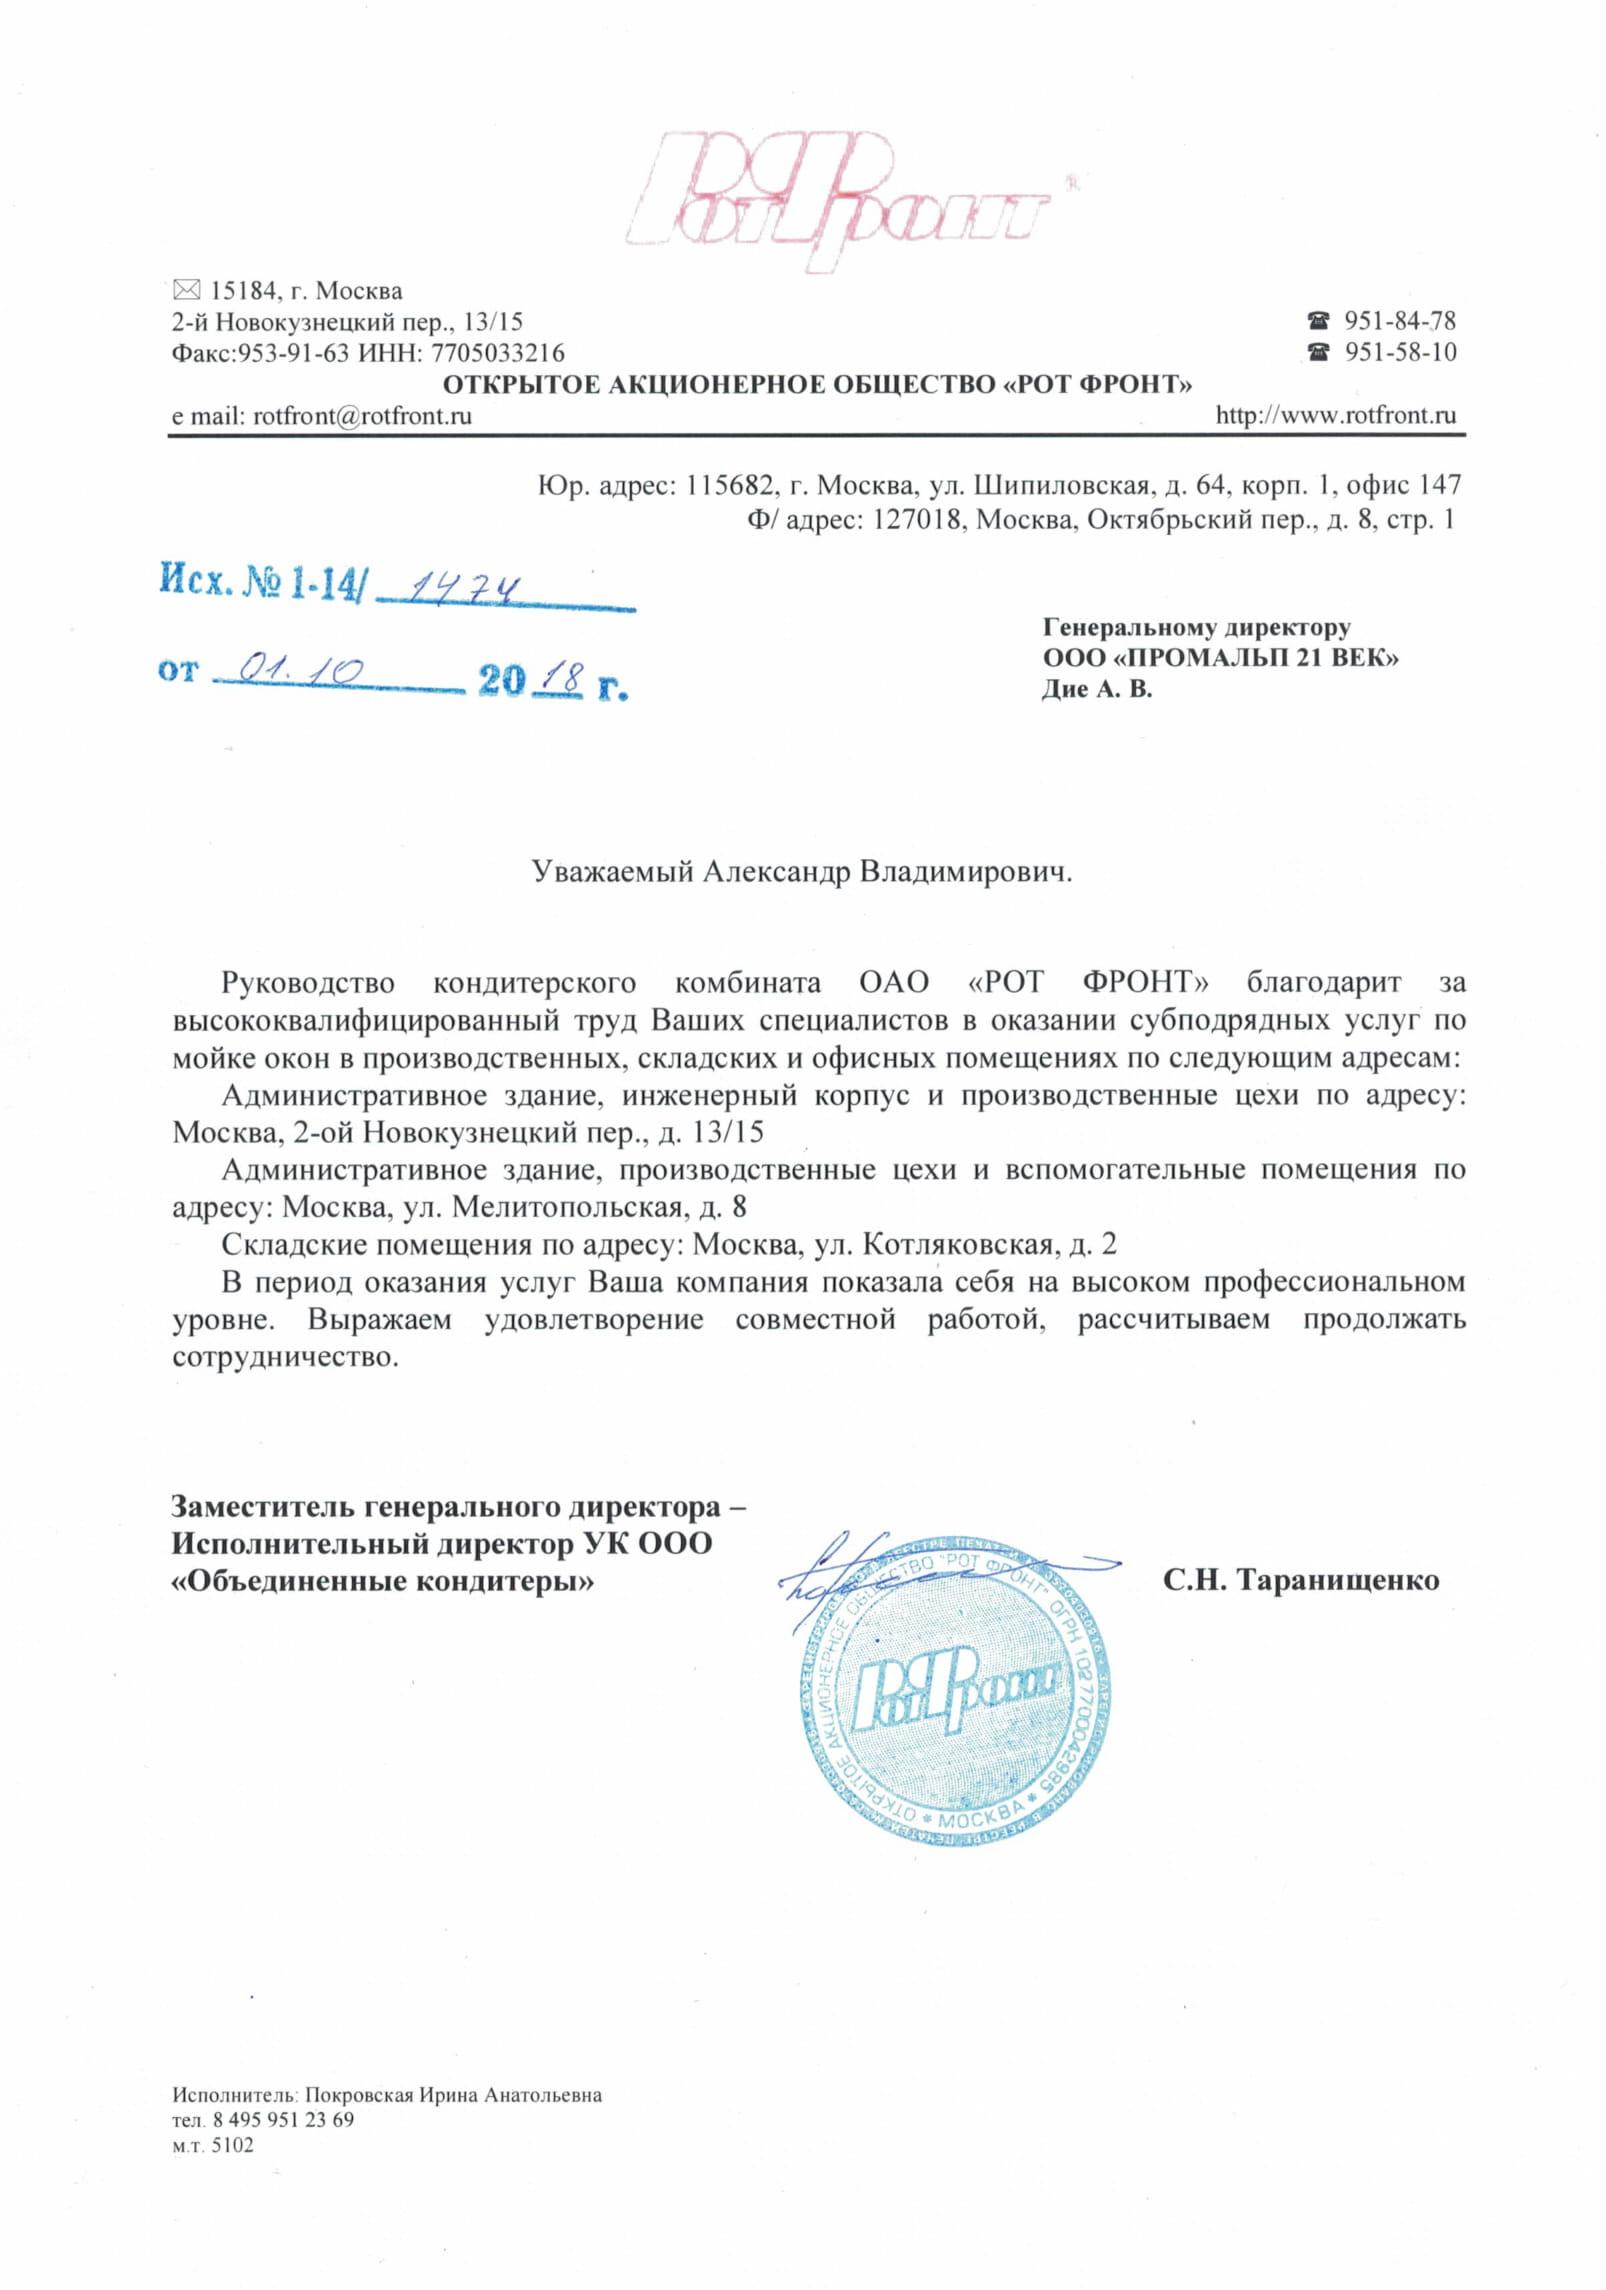 "ОАО ""РОТ ФРОНТ"" – Отзыв о сотрудничестве"